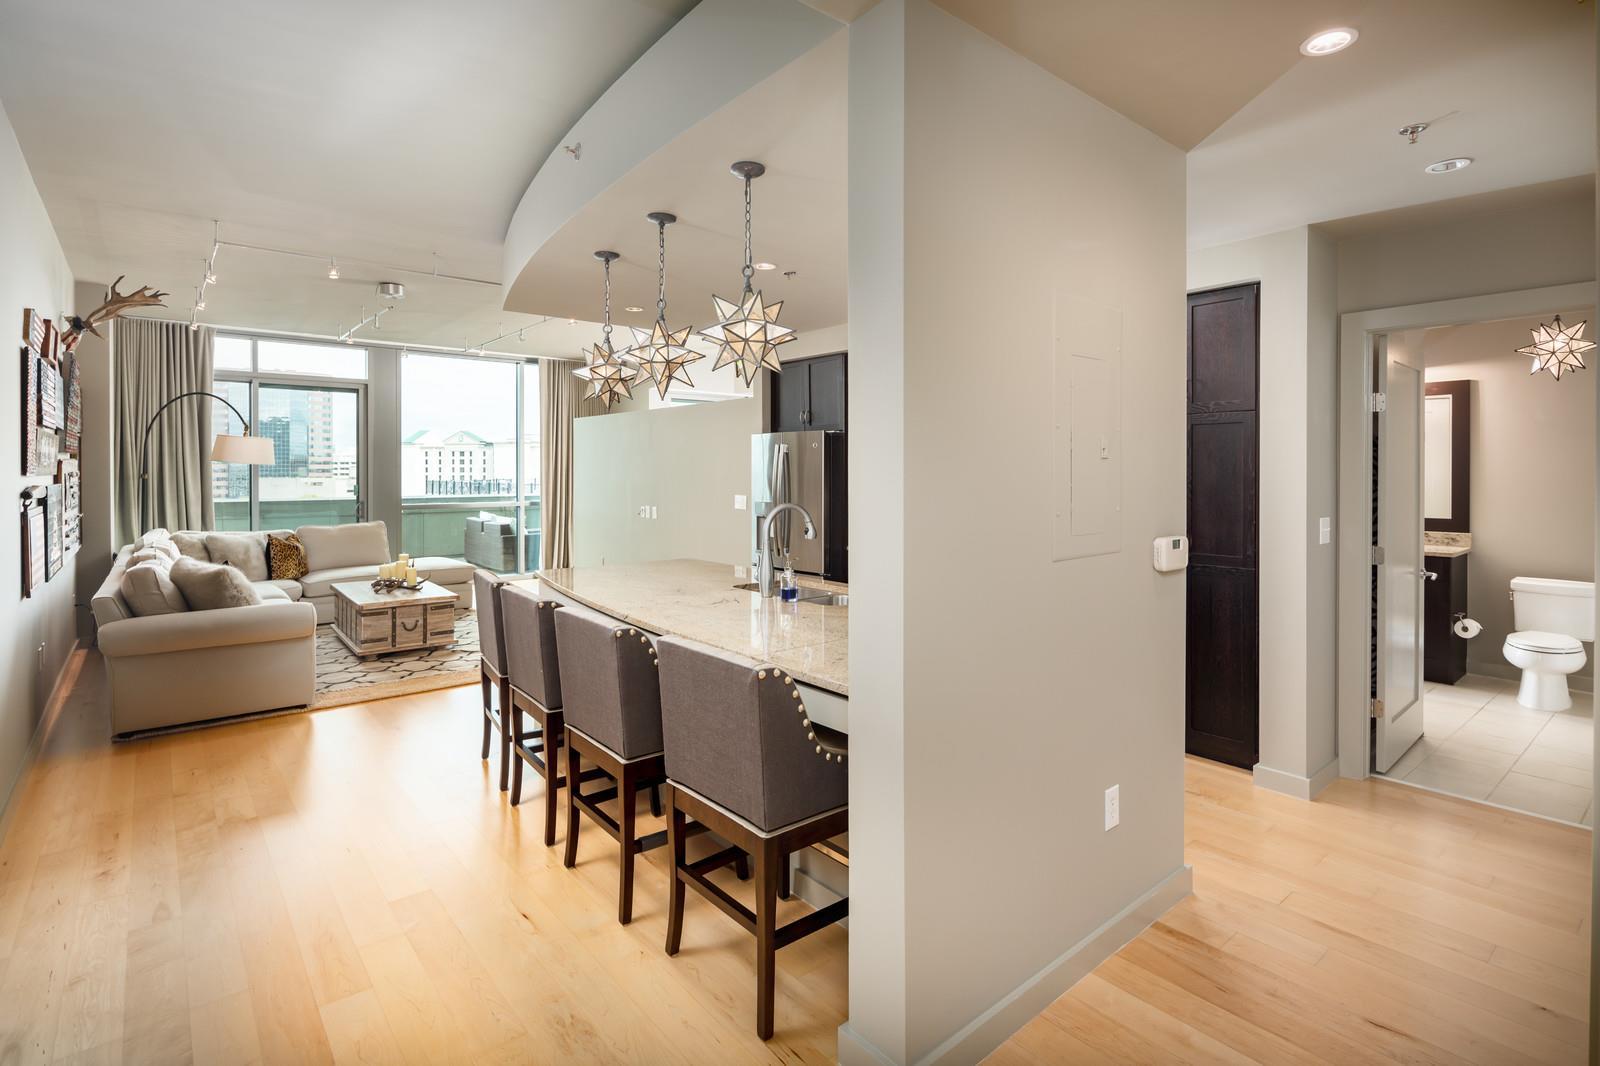 900 20Th Ave S Apt 603, Nashville, TN 37212 - Nashville, TN real estate listing